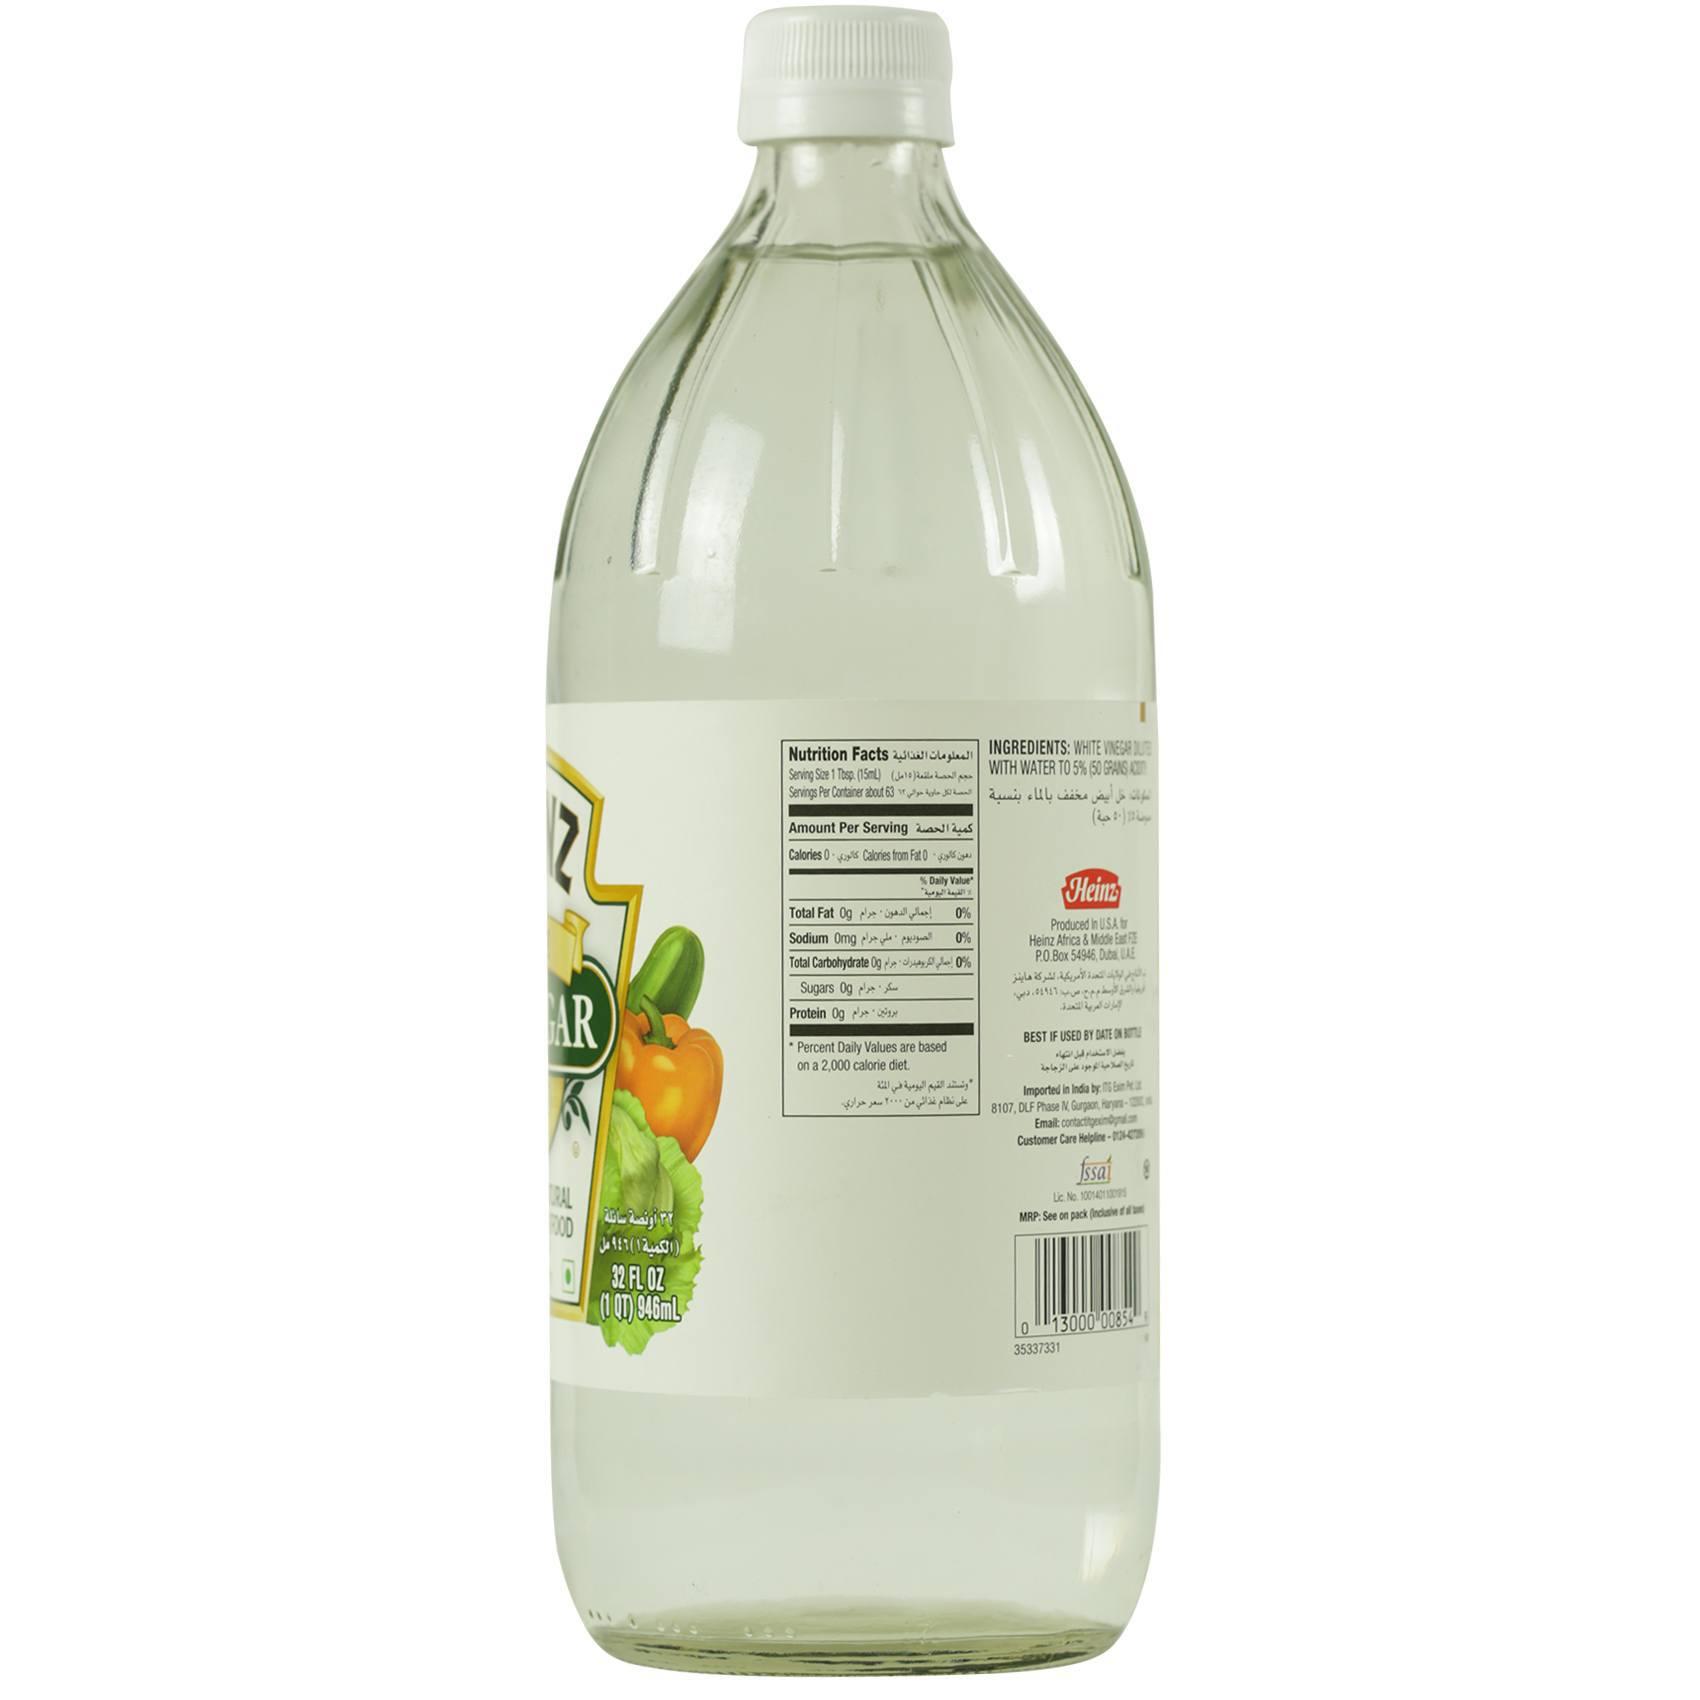 HEINZ WHITE VINEGAR 907G